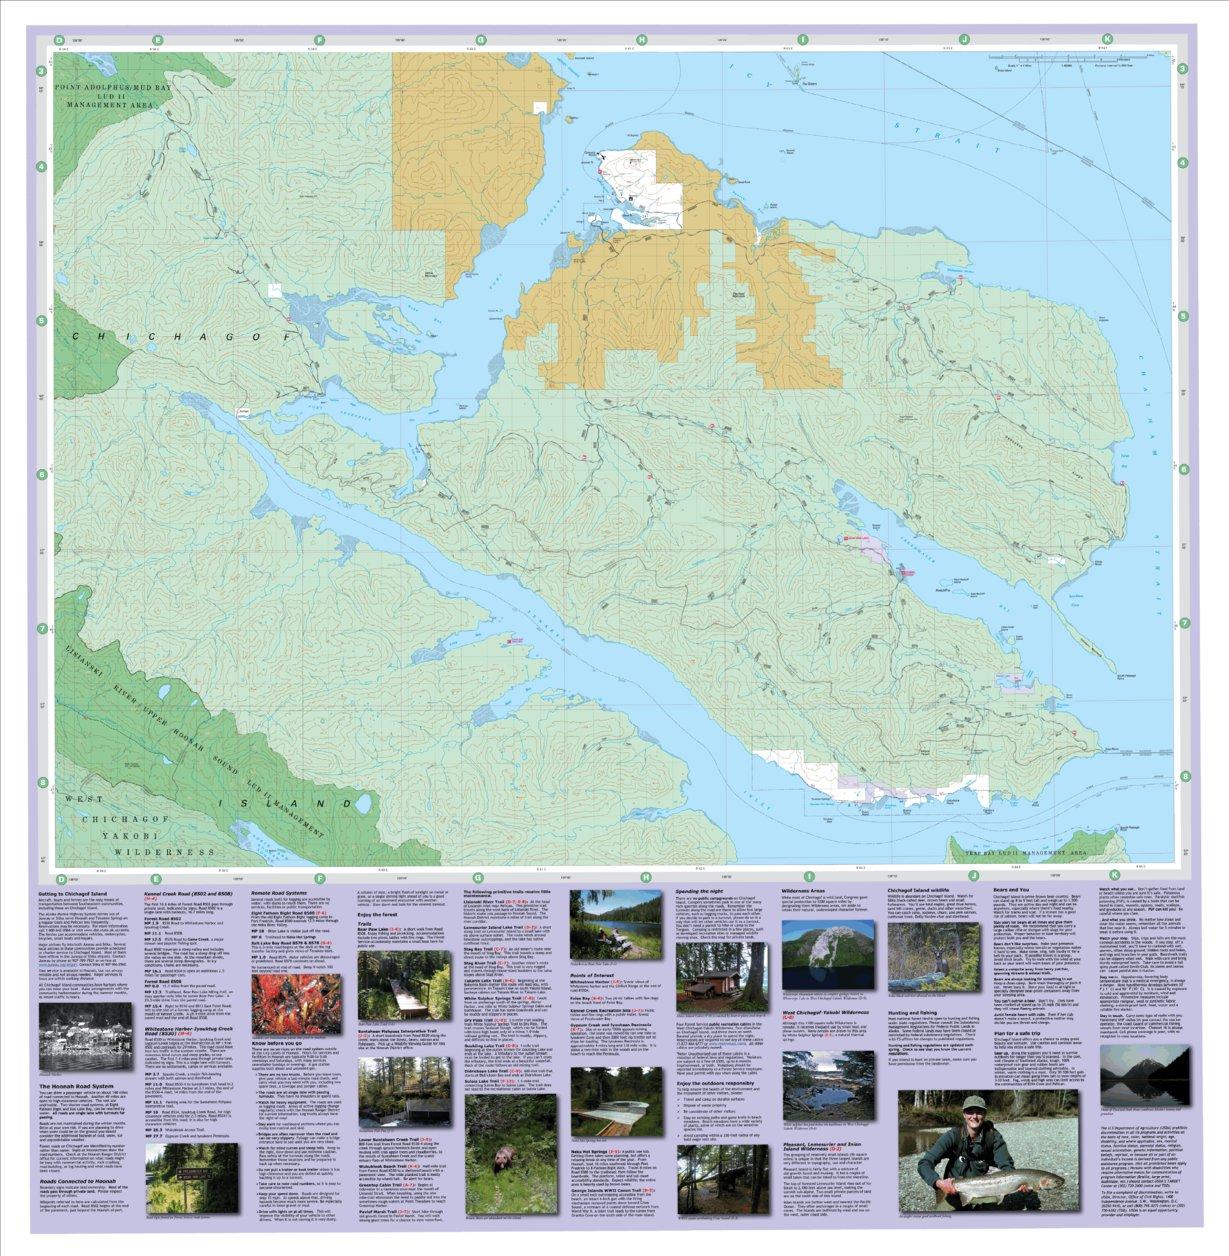 Huna Alaska Map.Chichagof Island Hoonah Area Hoonah Side Us Forest Service R10